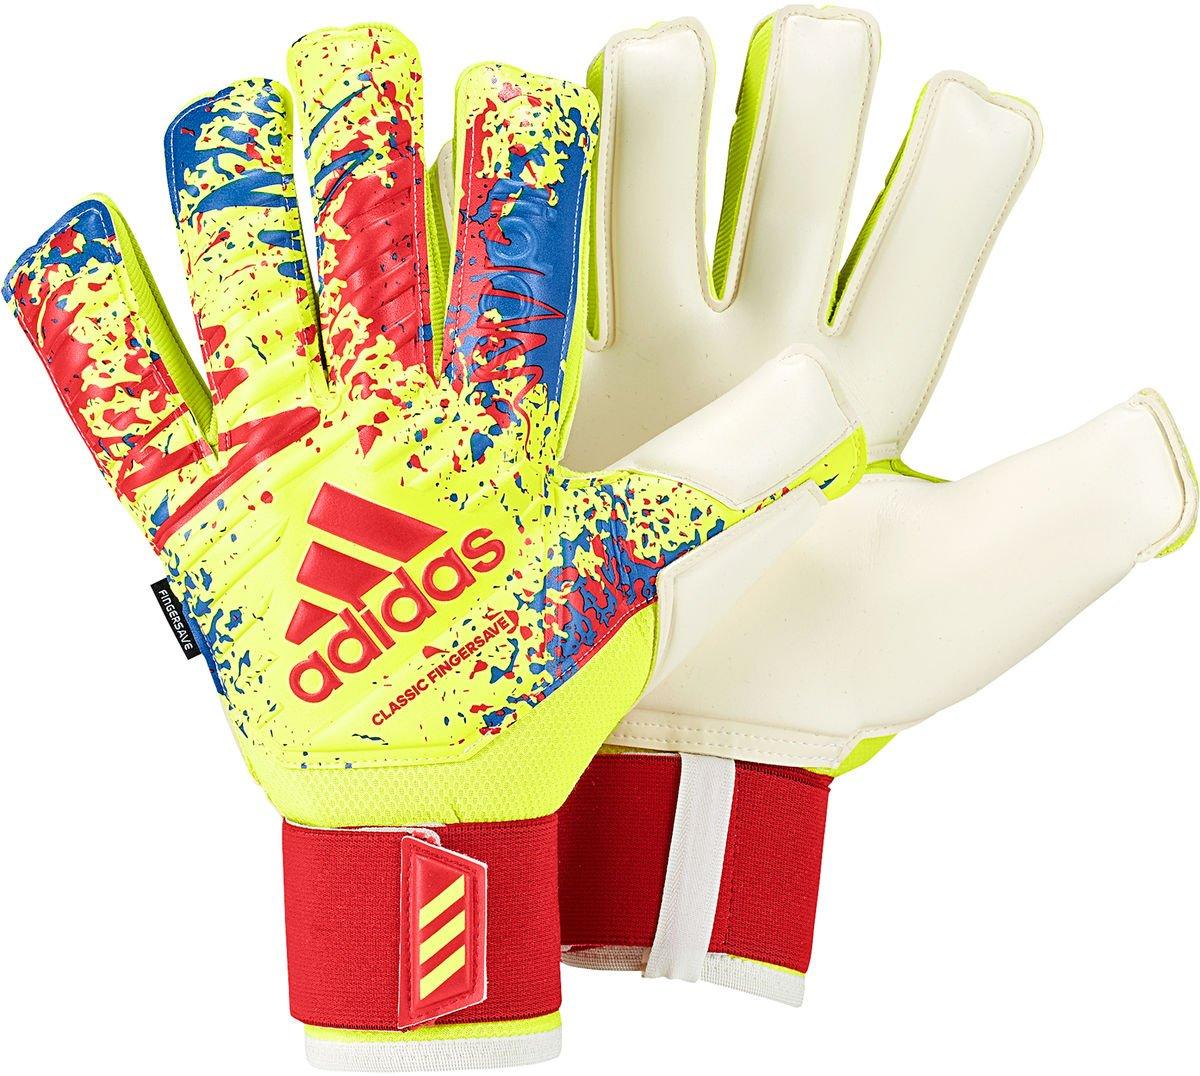 Goalkeeper's gloves adidas CLASSIC PRO FS